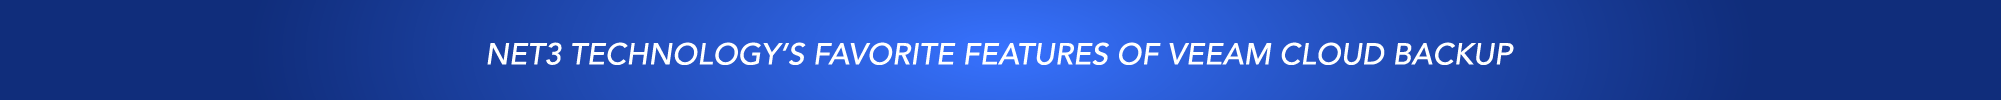 Veeam_webpage favorite features-02